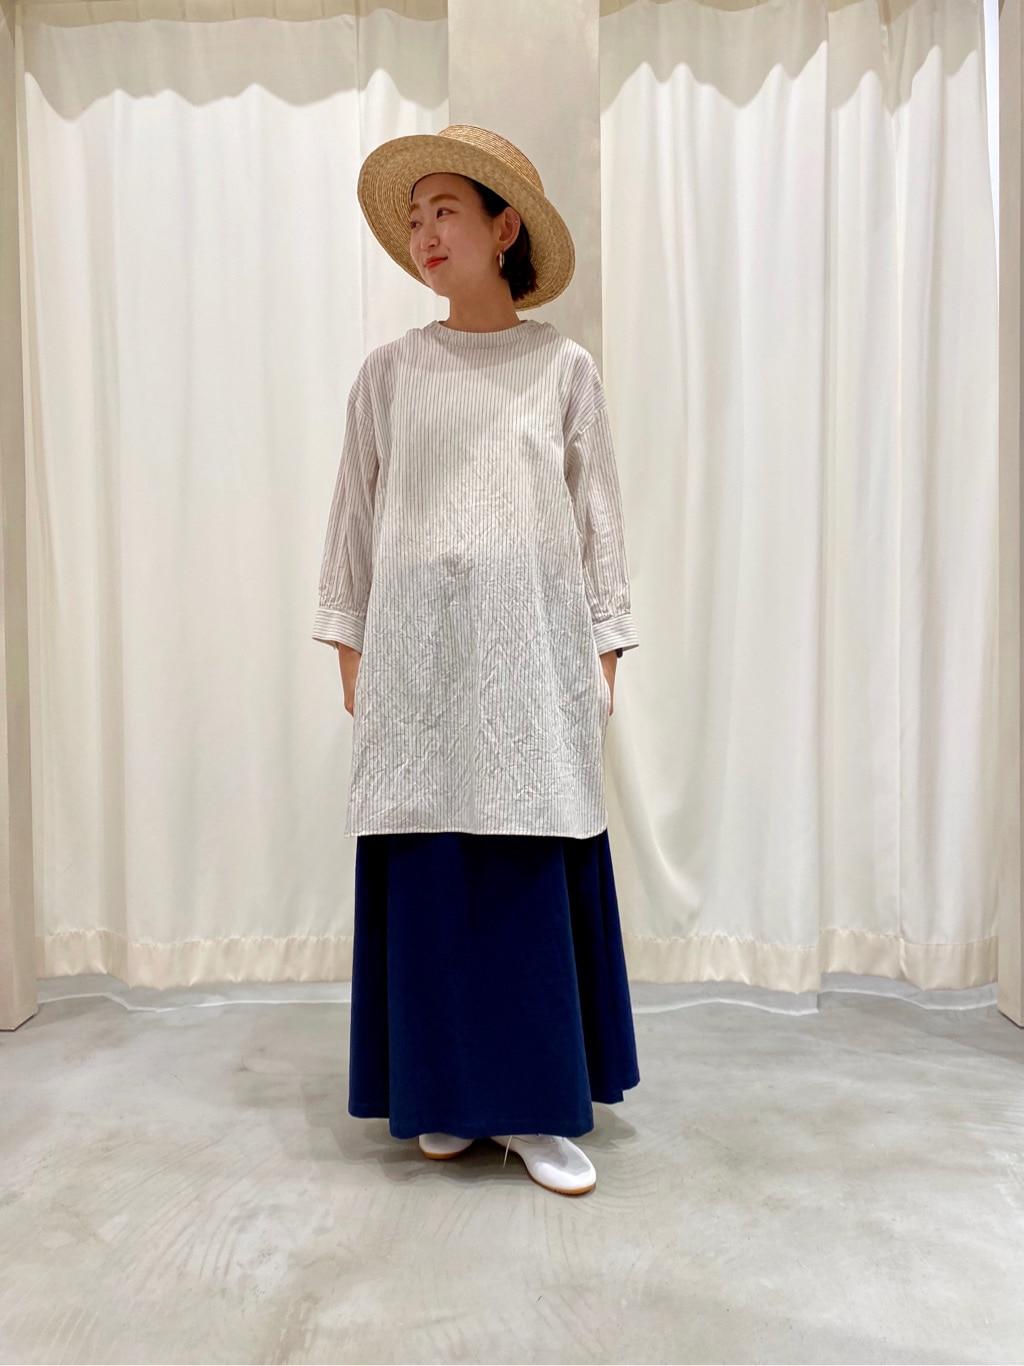 CHILD WOMAN , PAR ICI 東京スカイツリータウン・ソラマチ 2020.06.17